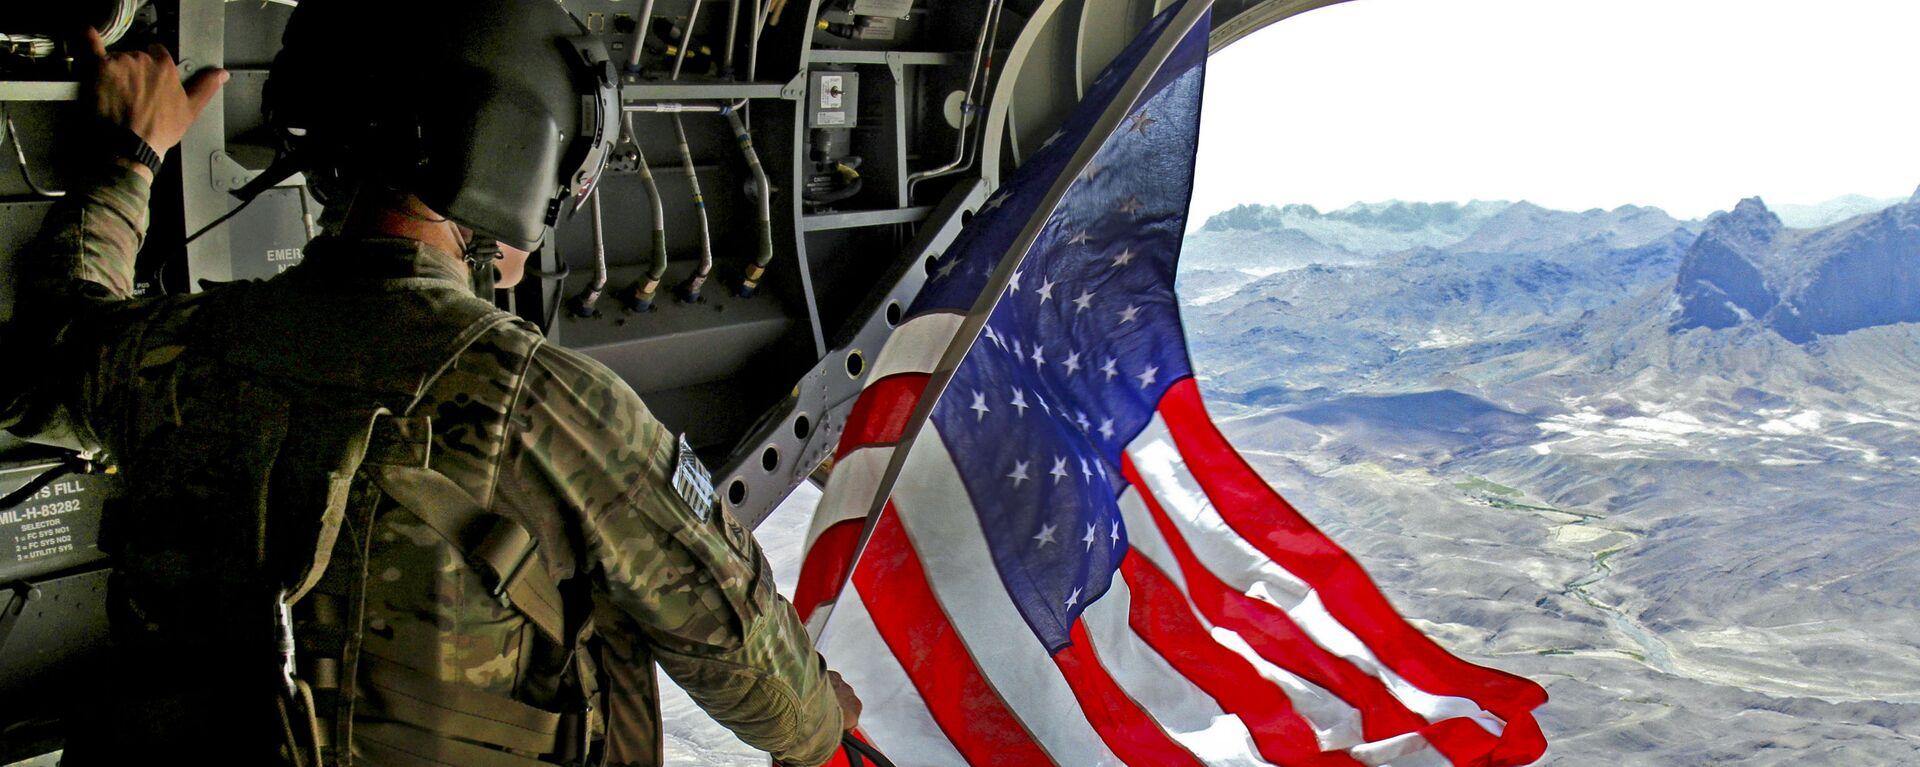 Americký voják s vlajkou USA v Afghánistánu - Sputnik Česká republika, 1920, 13.08.2021